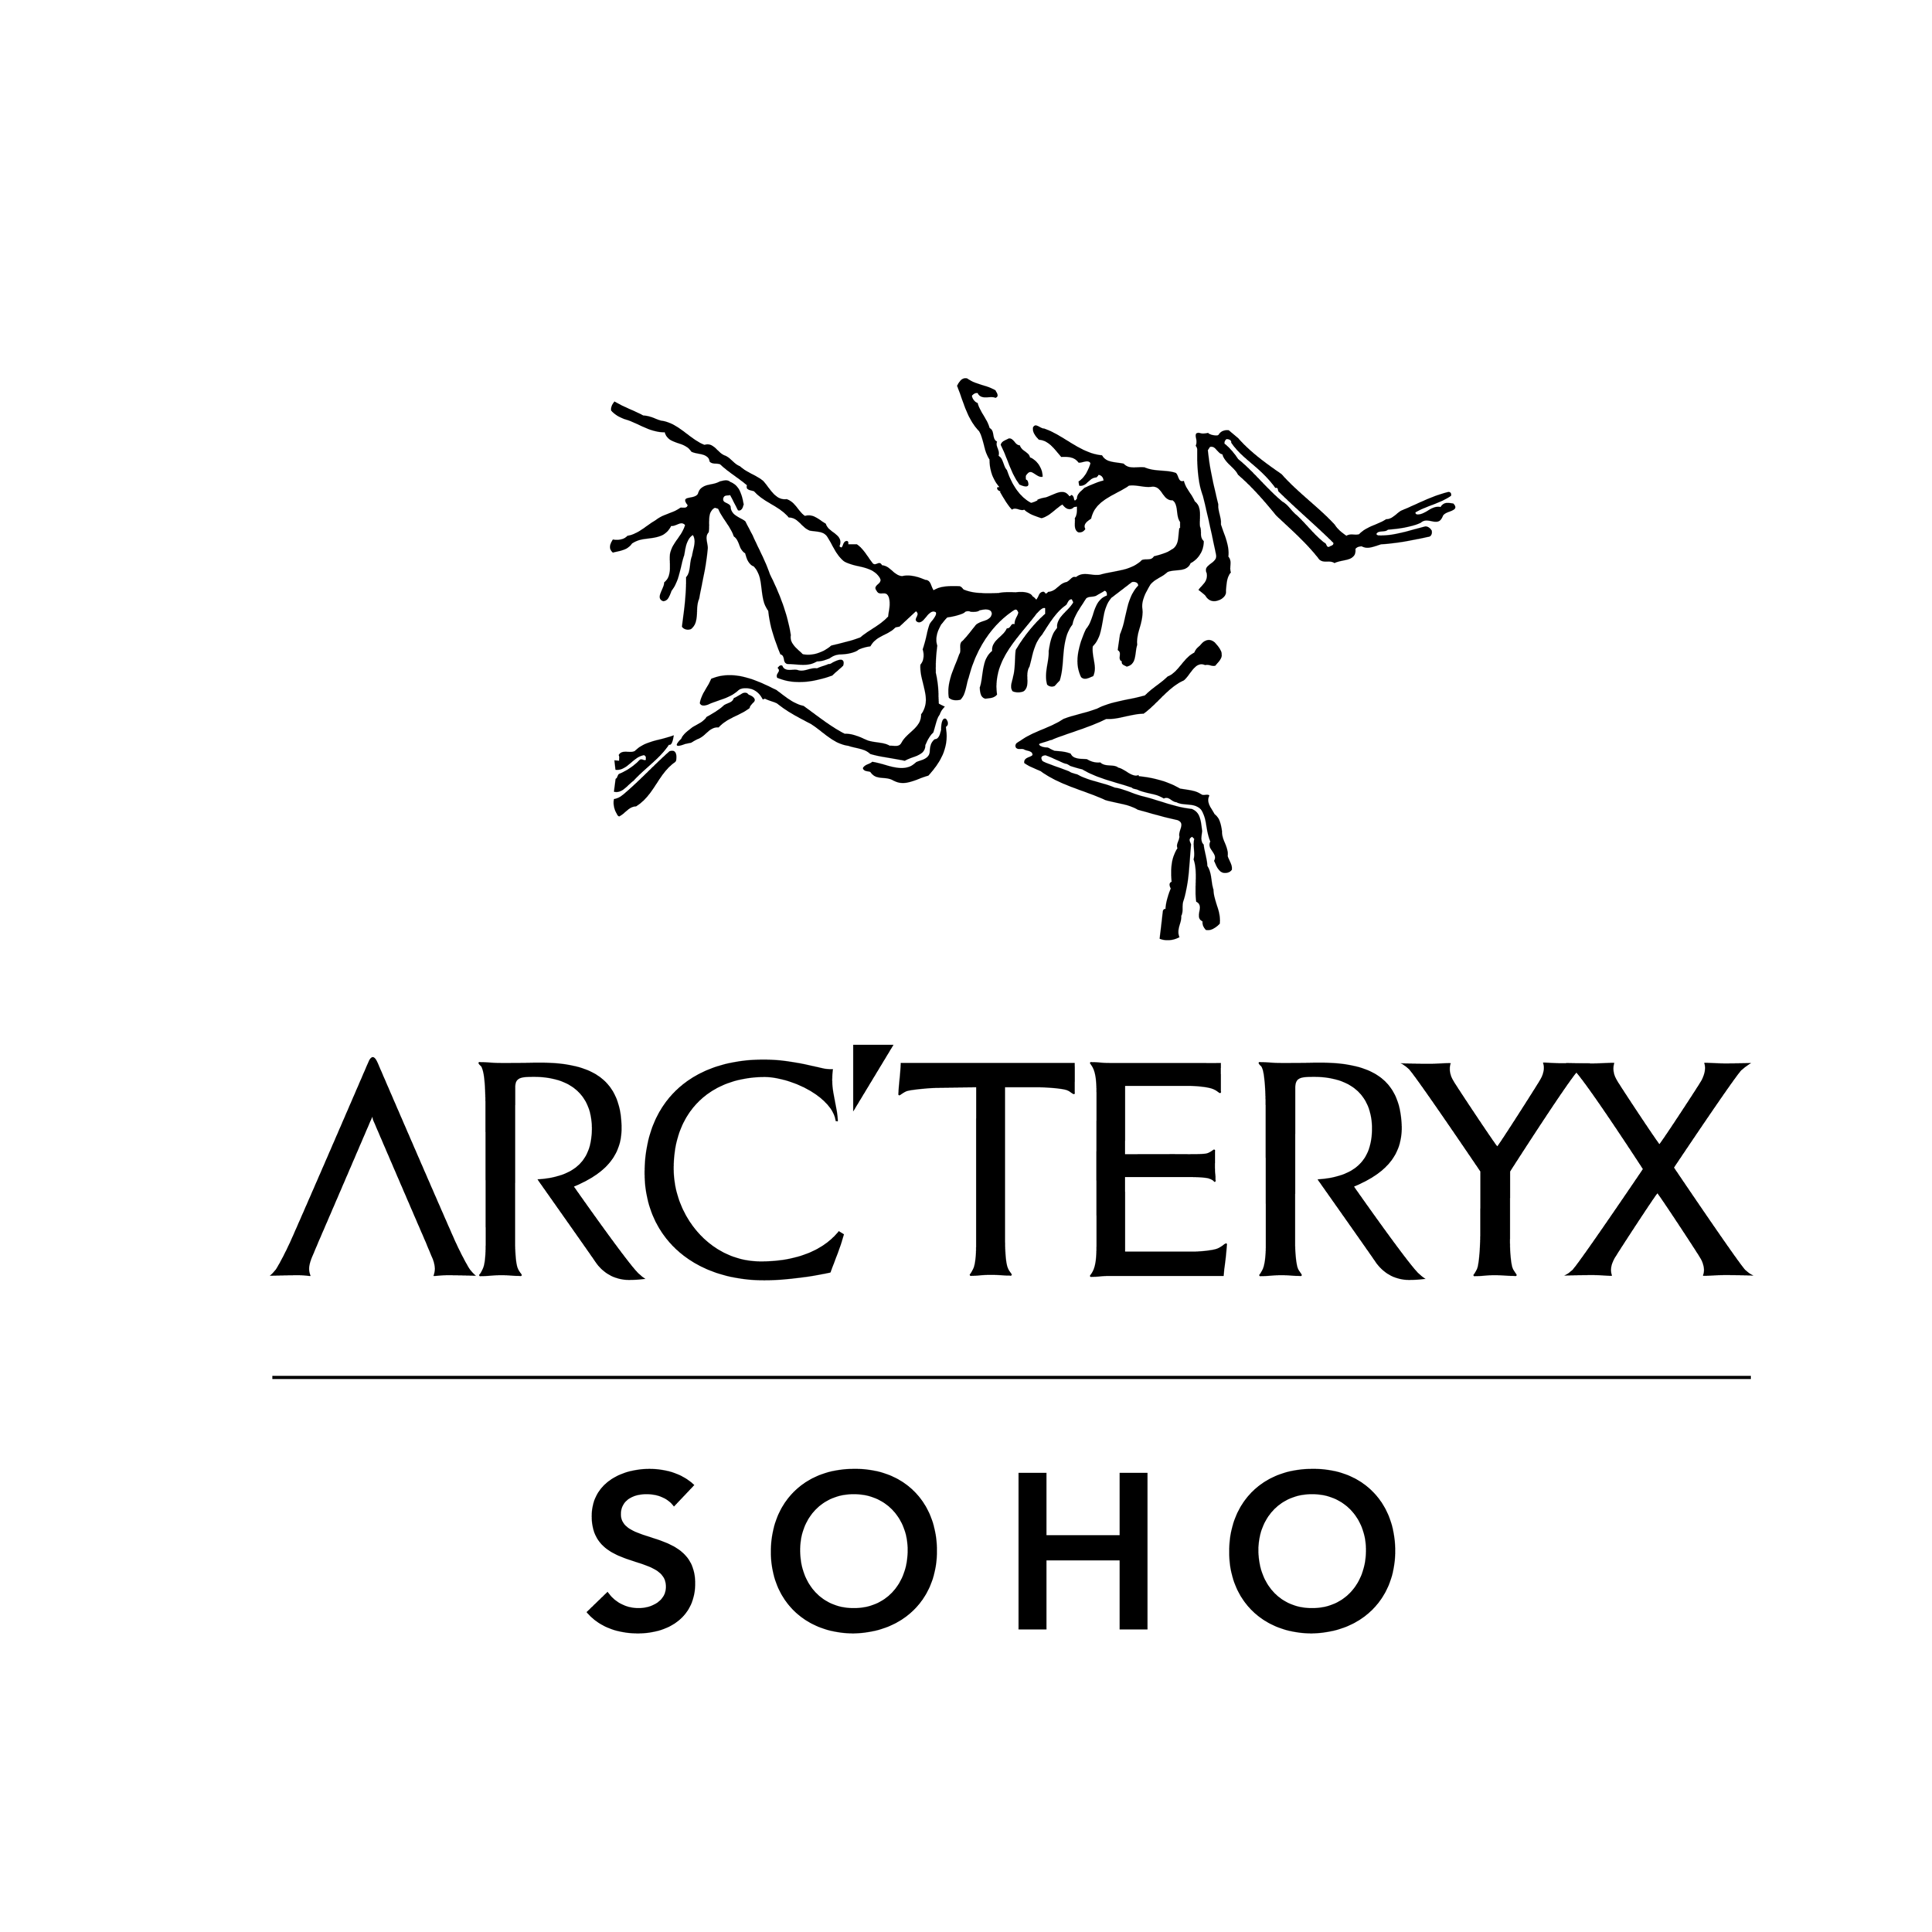 arcteryx-soho-logo black (1).png